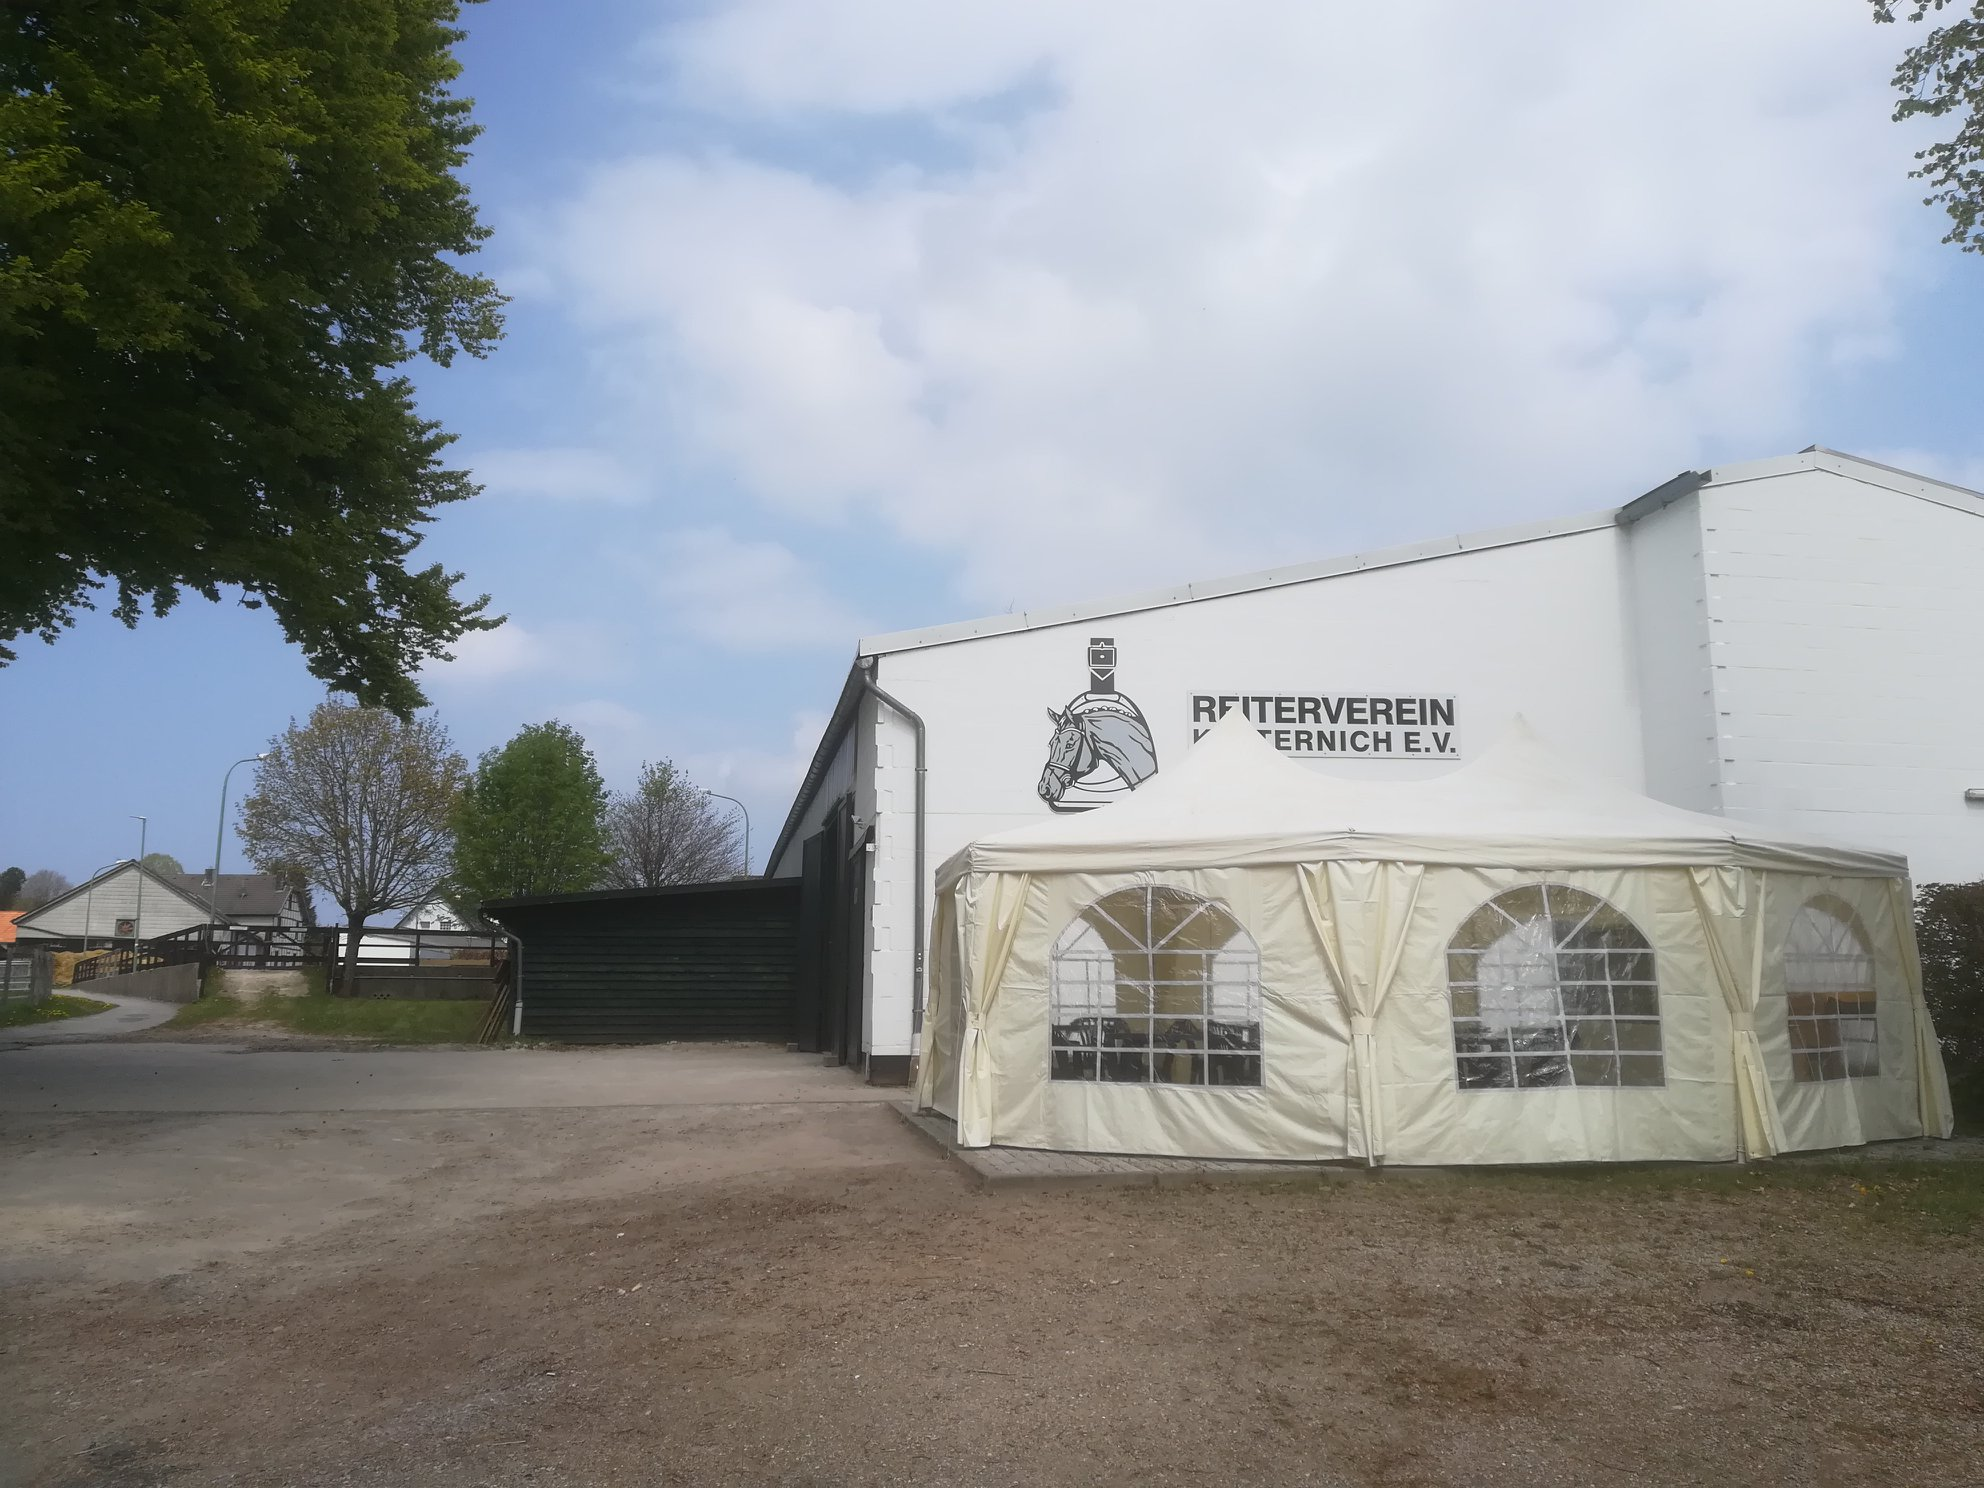 Reiterverein Kesternich Eifel